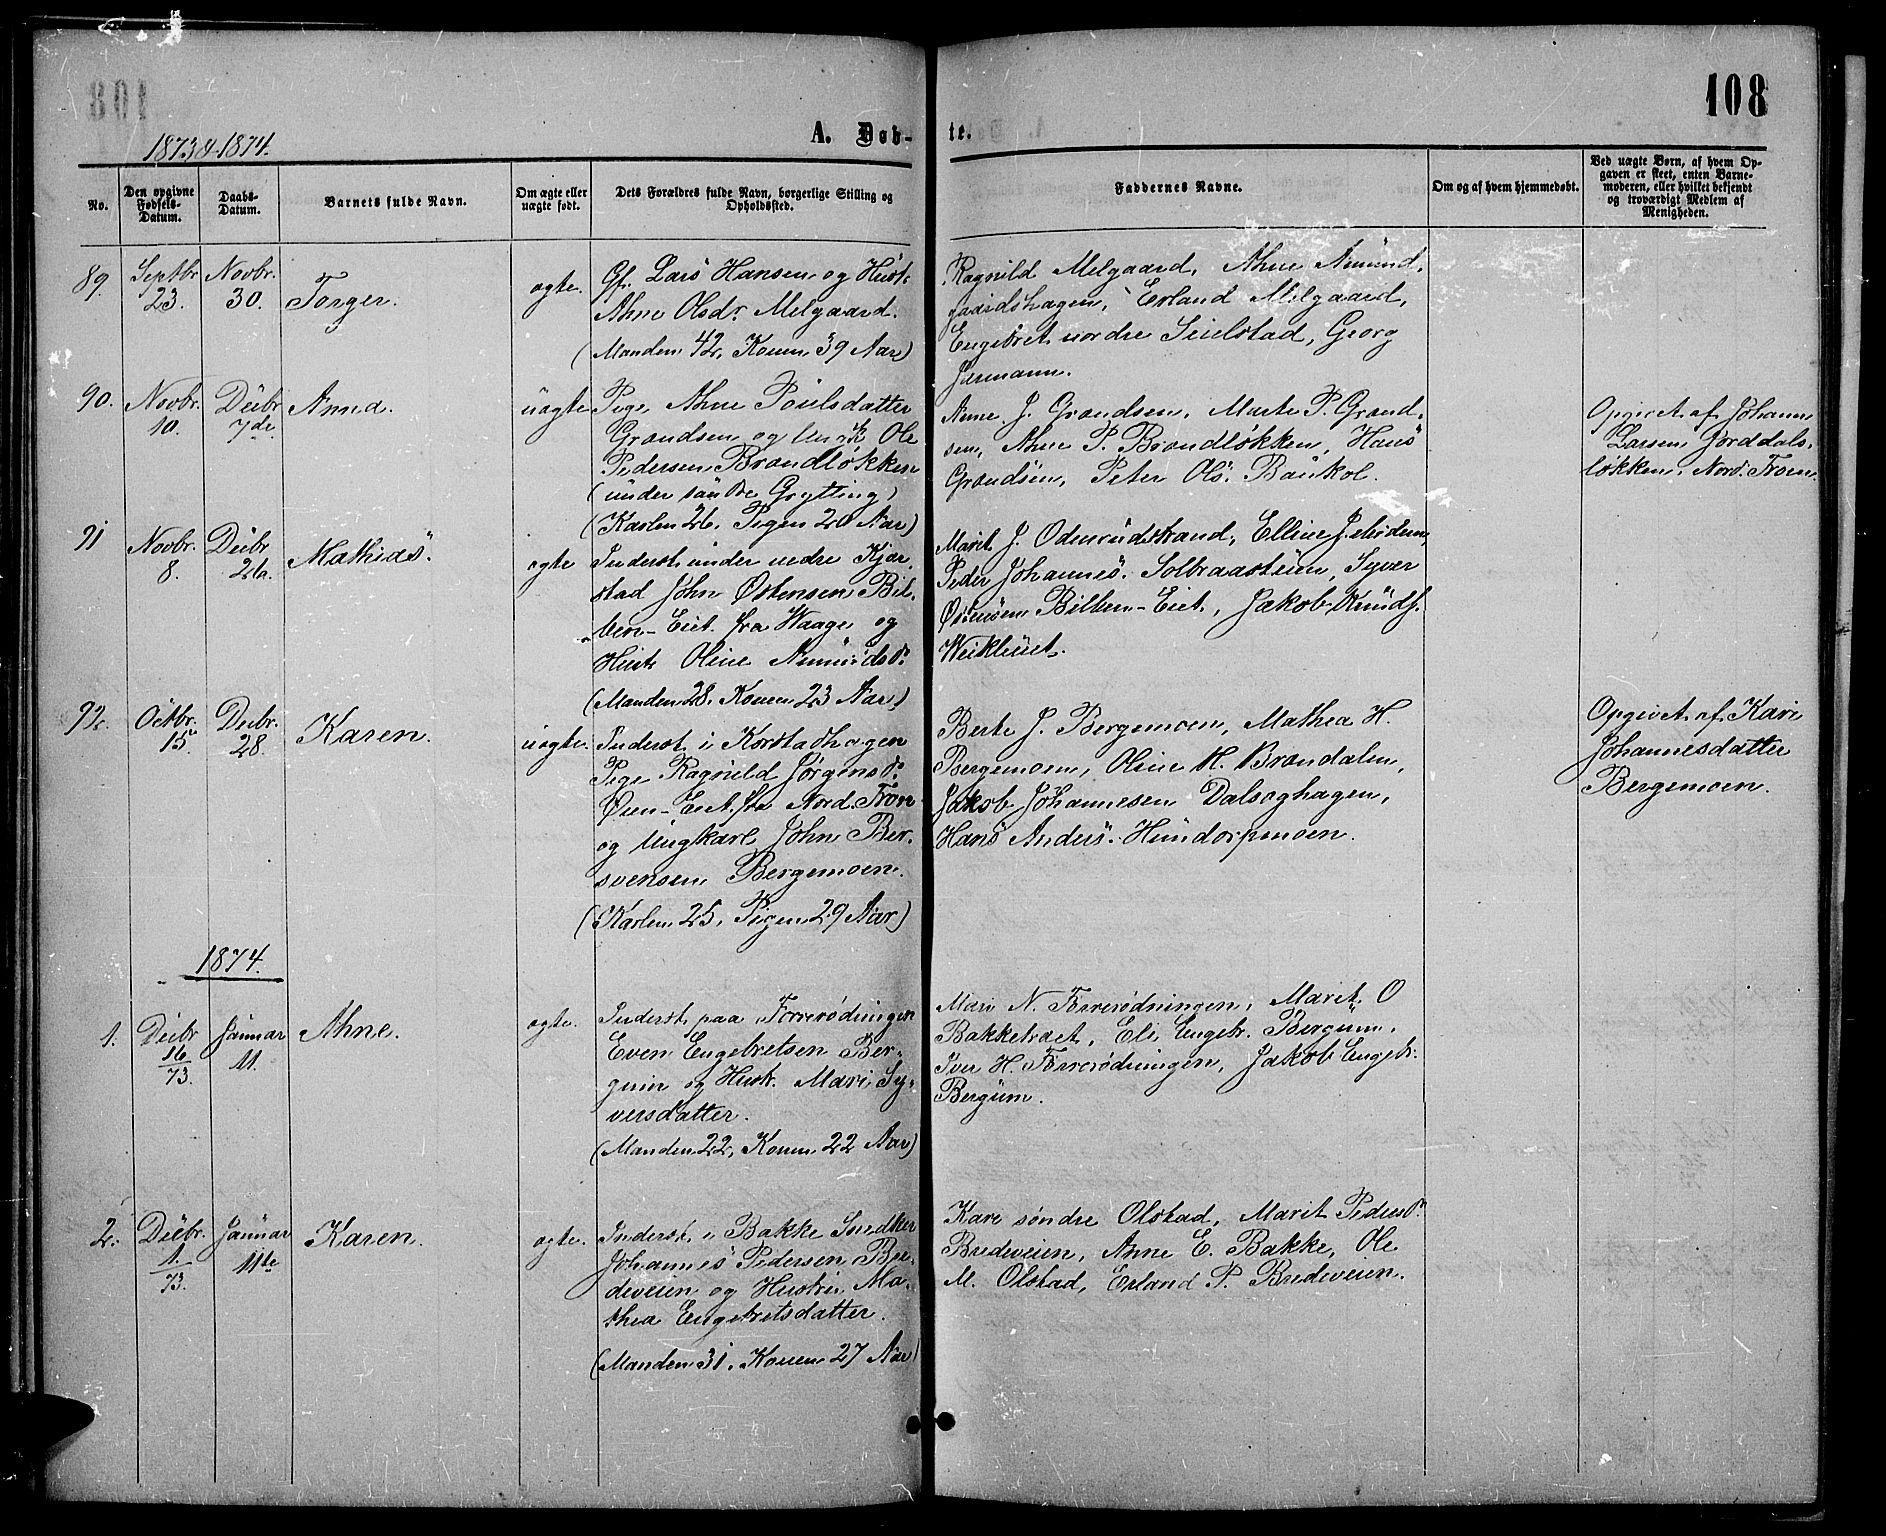 SAH, Sør-Fron prestekontor, H/Ha/Hab/L0002: Klokkerbok nr. 2, 1864-1883, s. 108